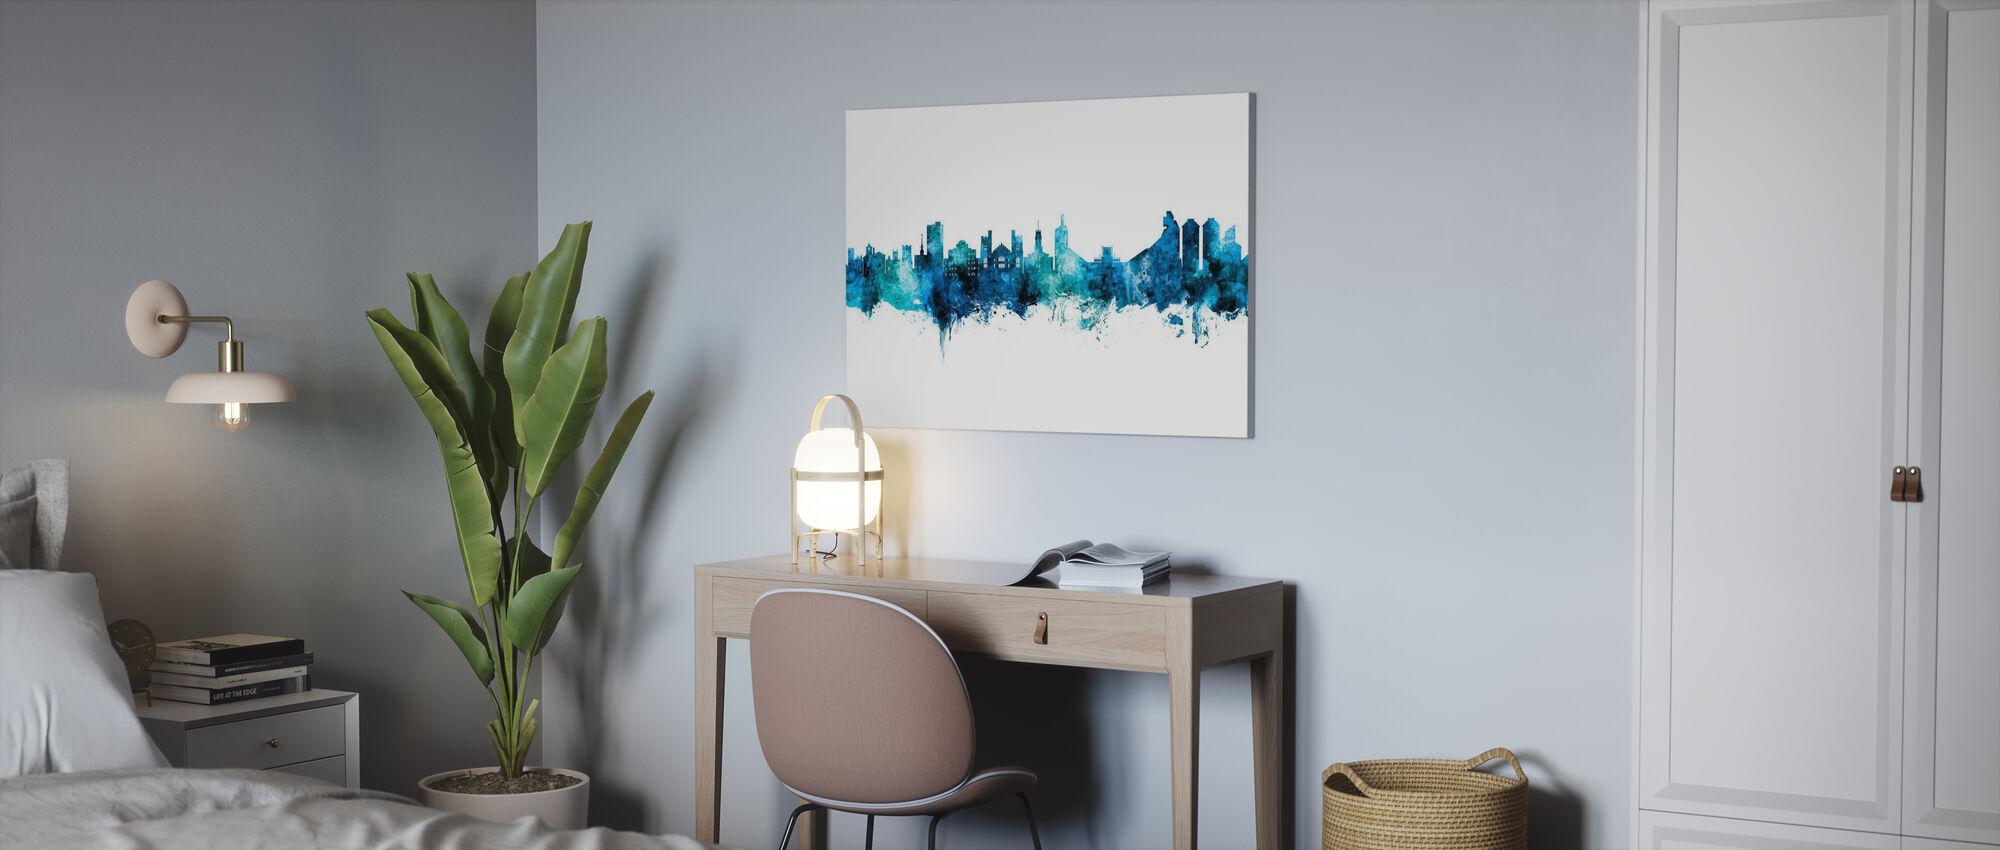 Boulder Colorado Skyline - Canvas print - Office